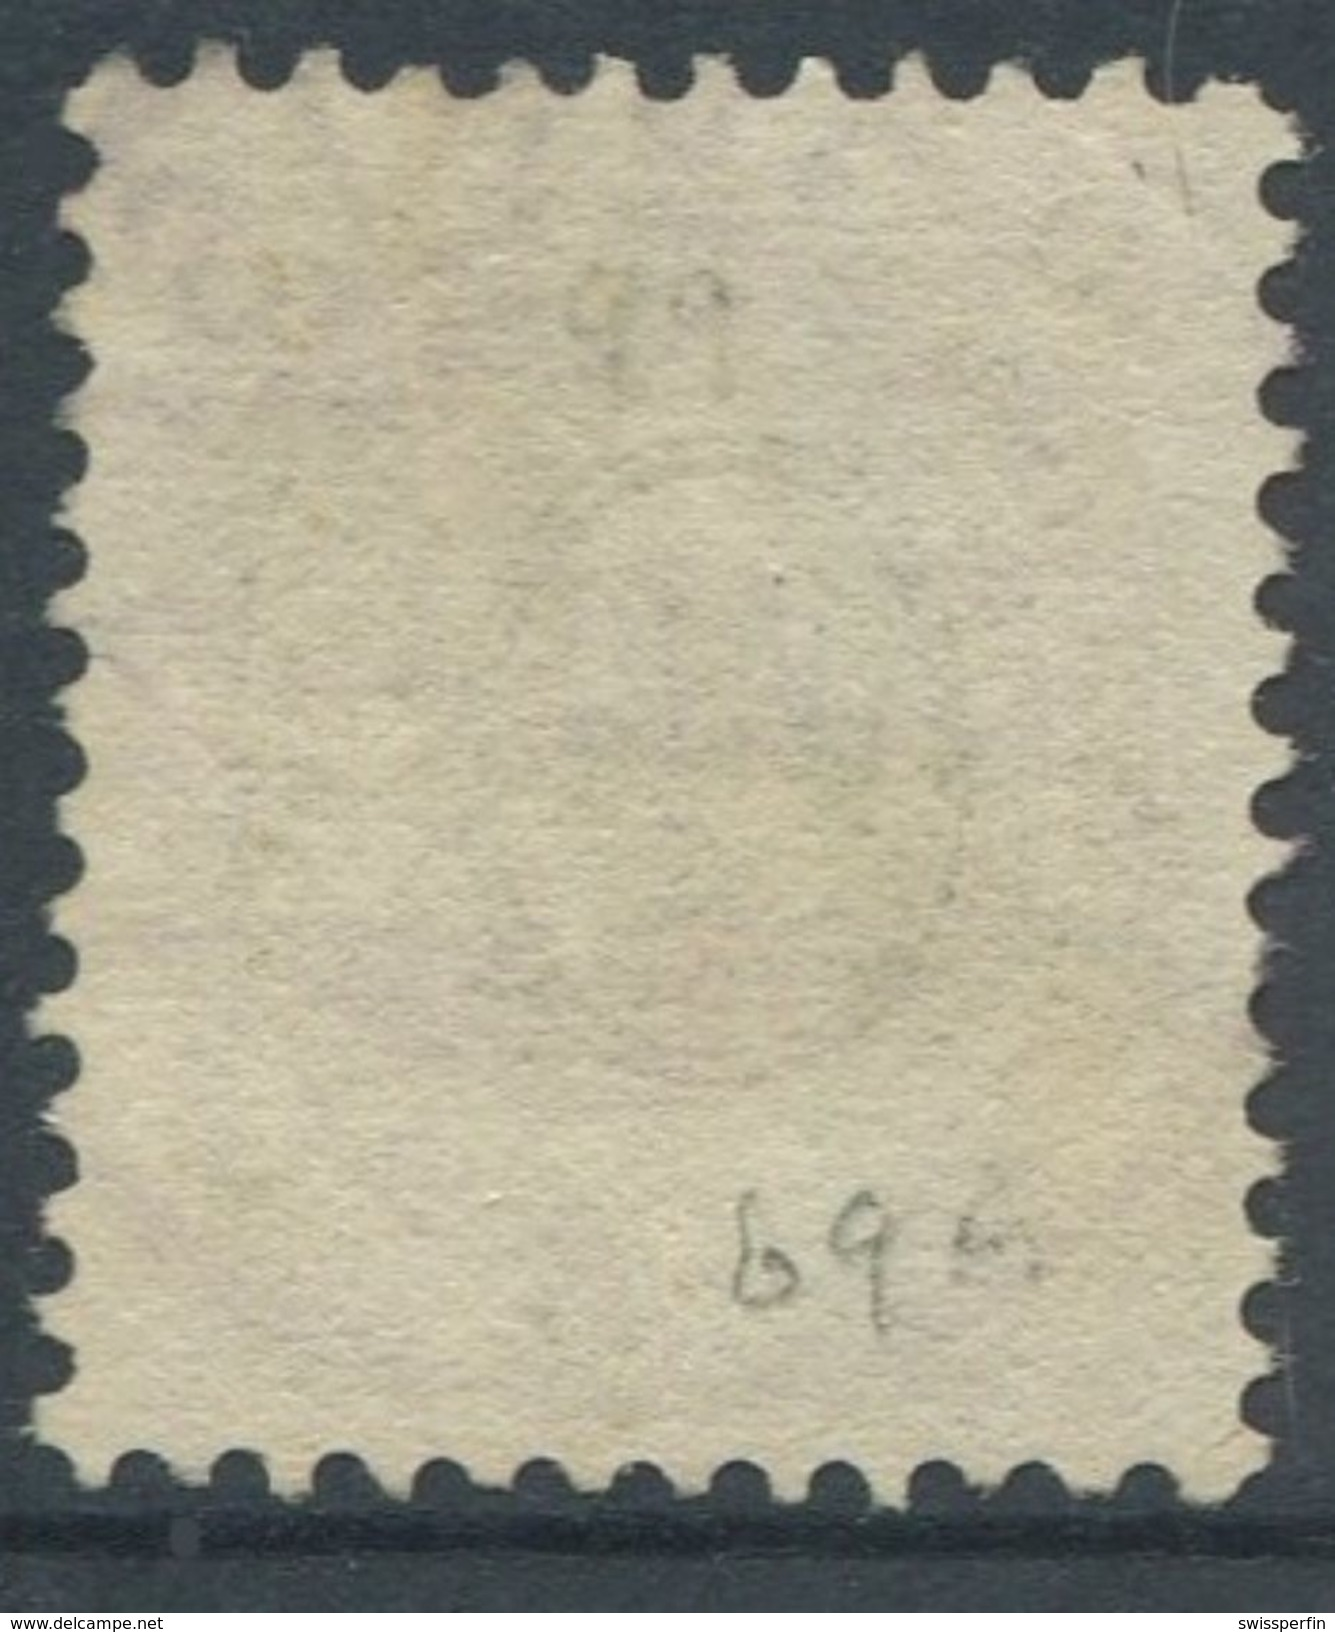 1652 - 40 Rp. Stehende Helvetia Mit Vollstempel THUSIS 27.IV.89 - 1882-1906 Wappen, Stehende Helvetia & UPU